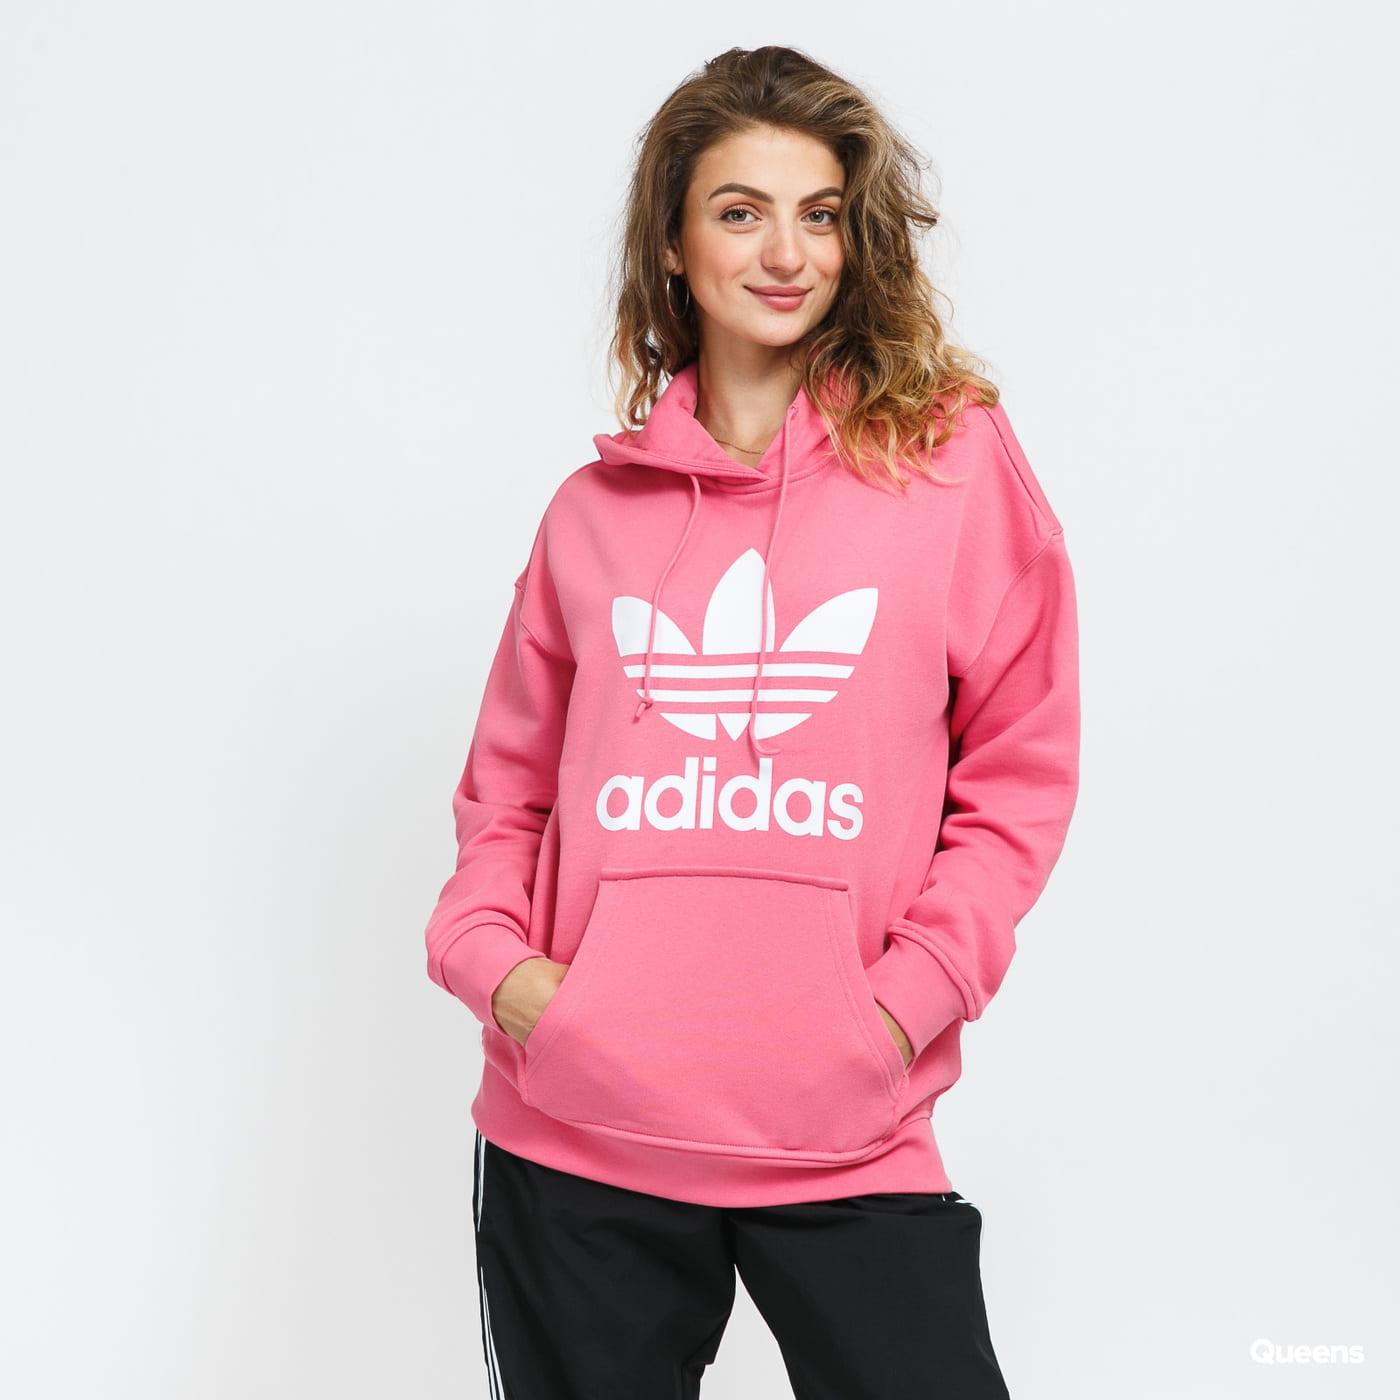 adidas Originals Trefoil Hoodie růžová